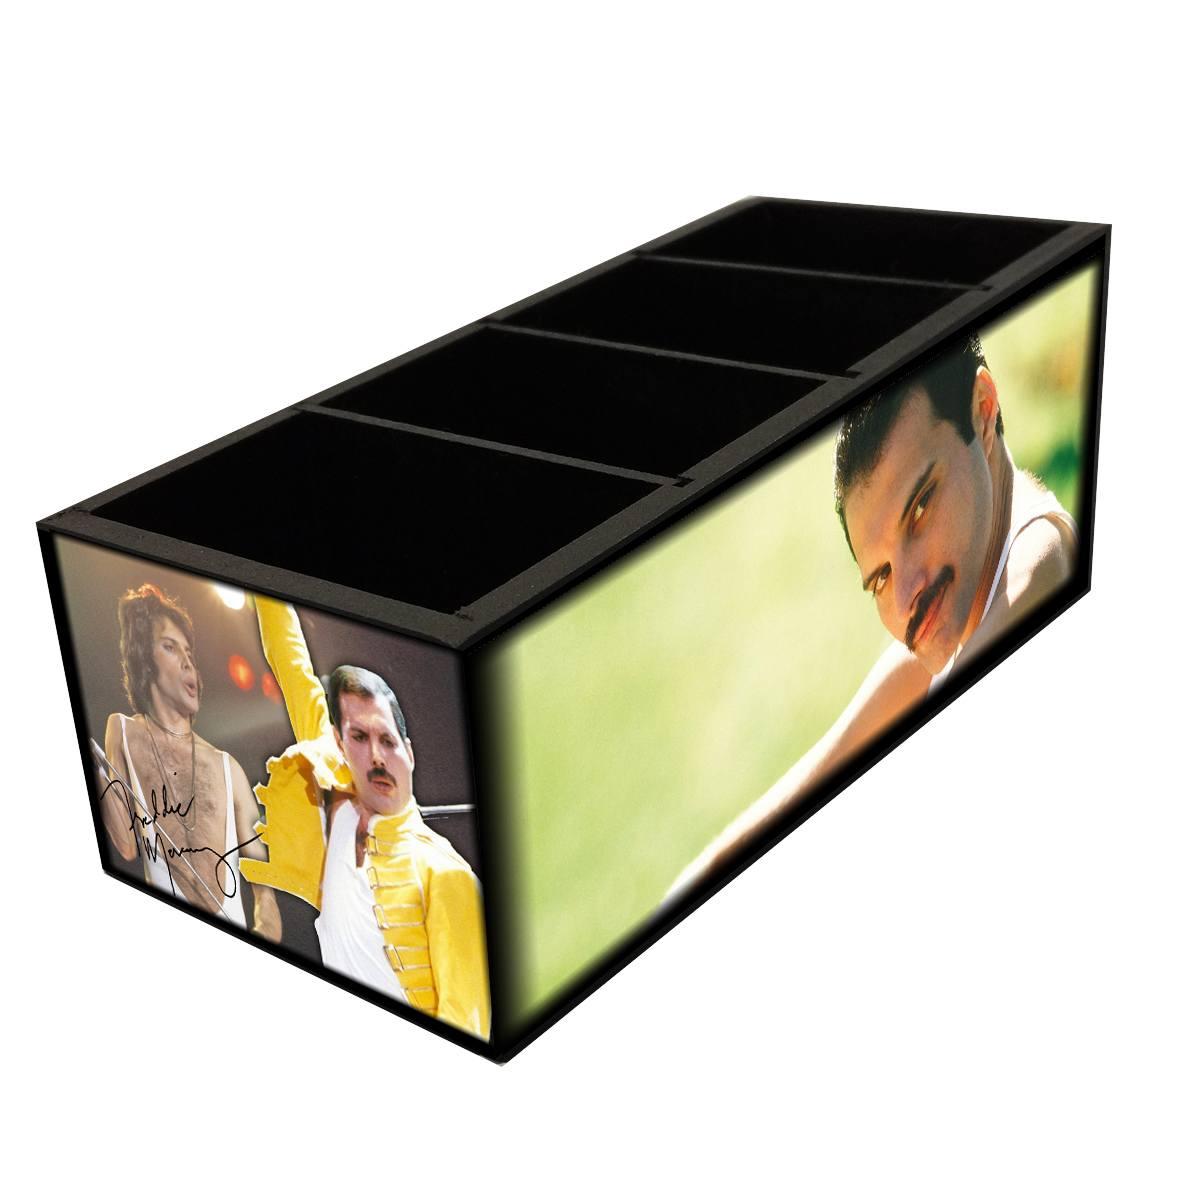 Freddie Mercury - Queen - Porta Controles em MDF - 4 Espaços - Mr. Rock